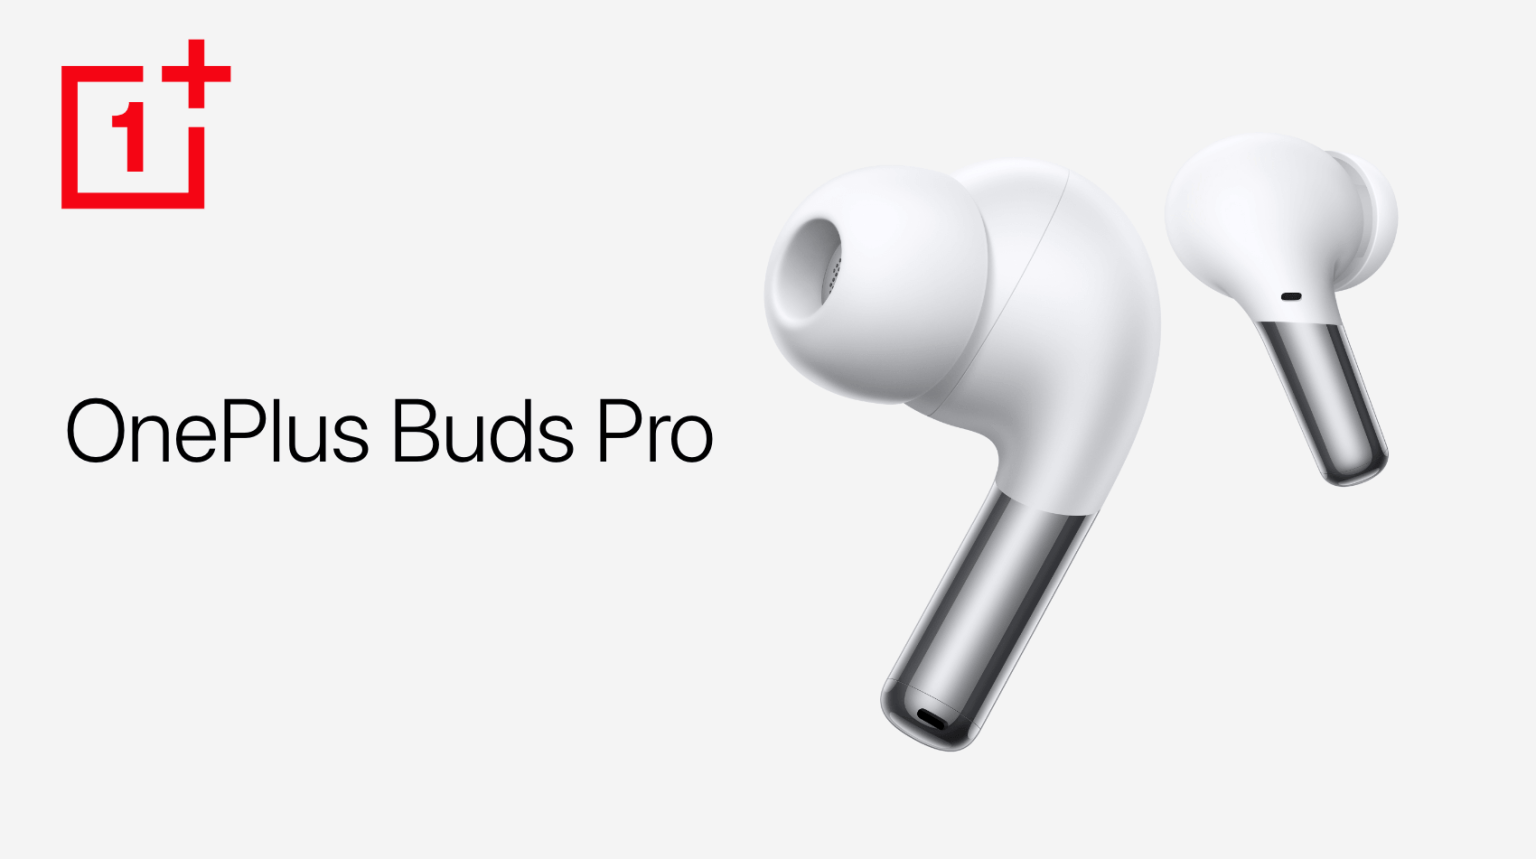 OnePlus Buds Pro (Glosse White)